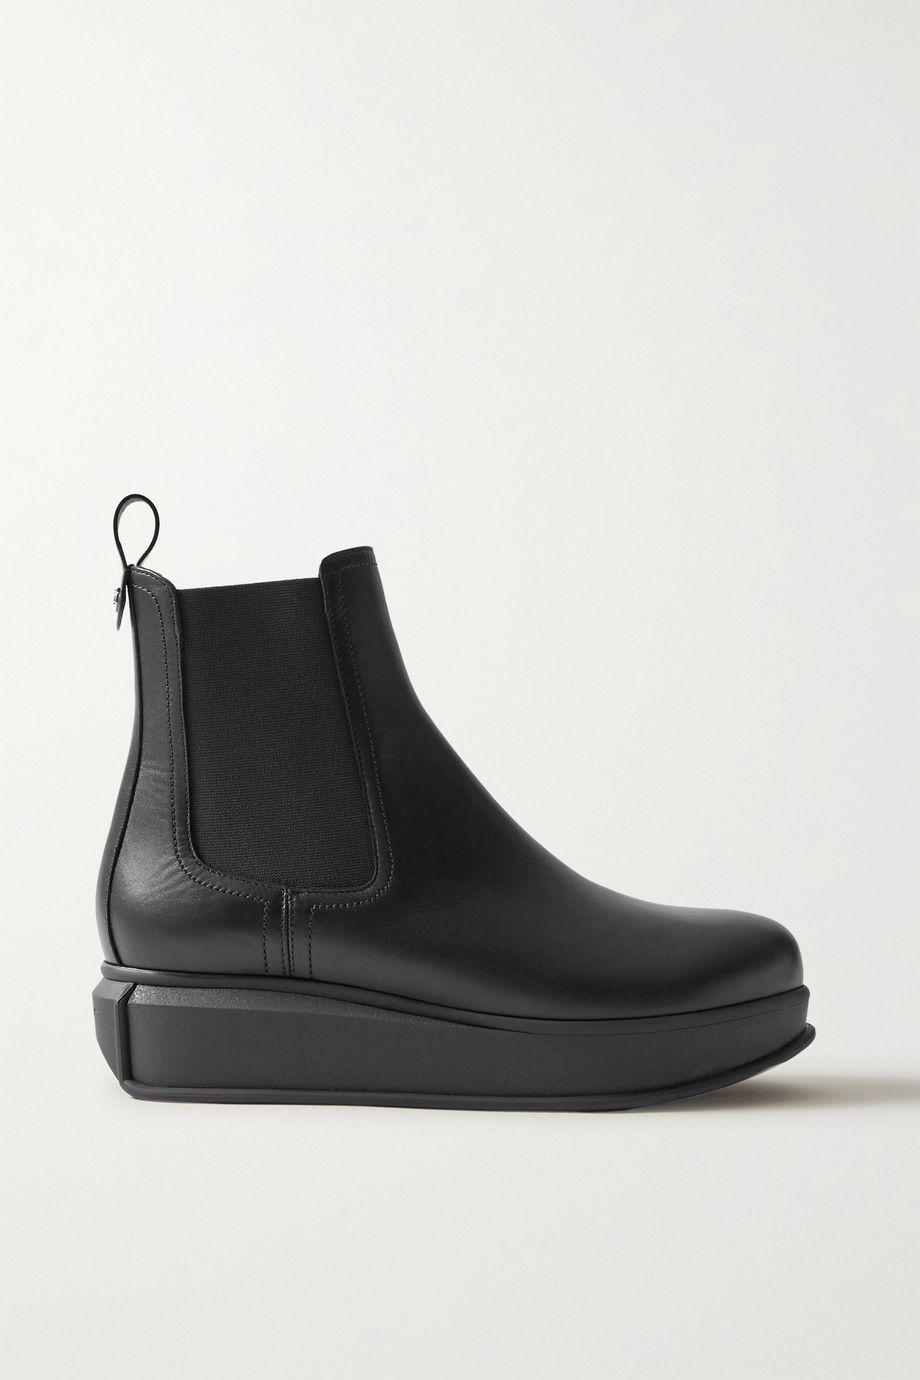 Salvatore Ferragamo Kay leather Chelsea boots